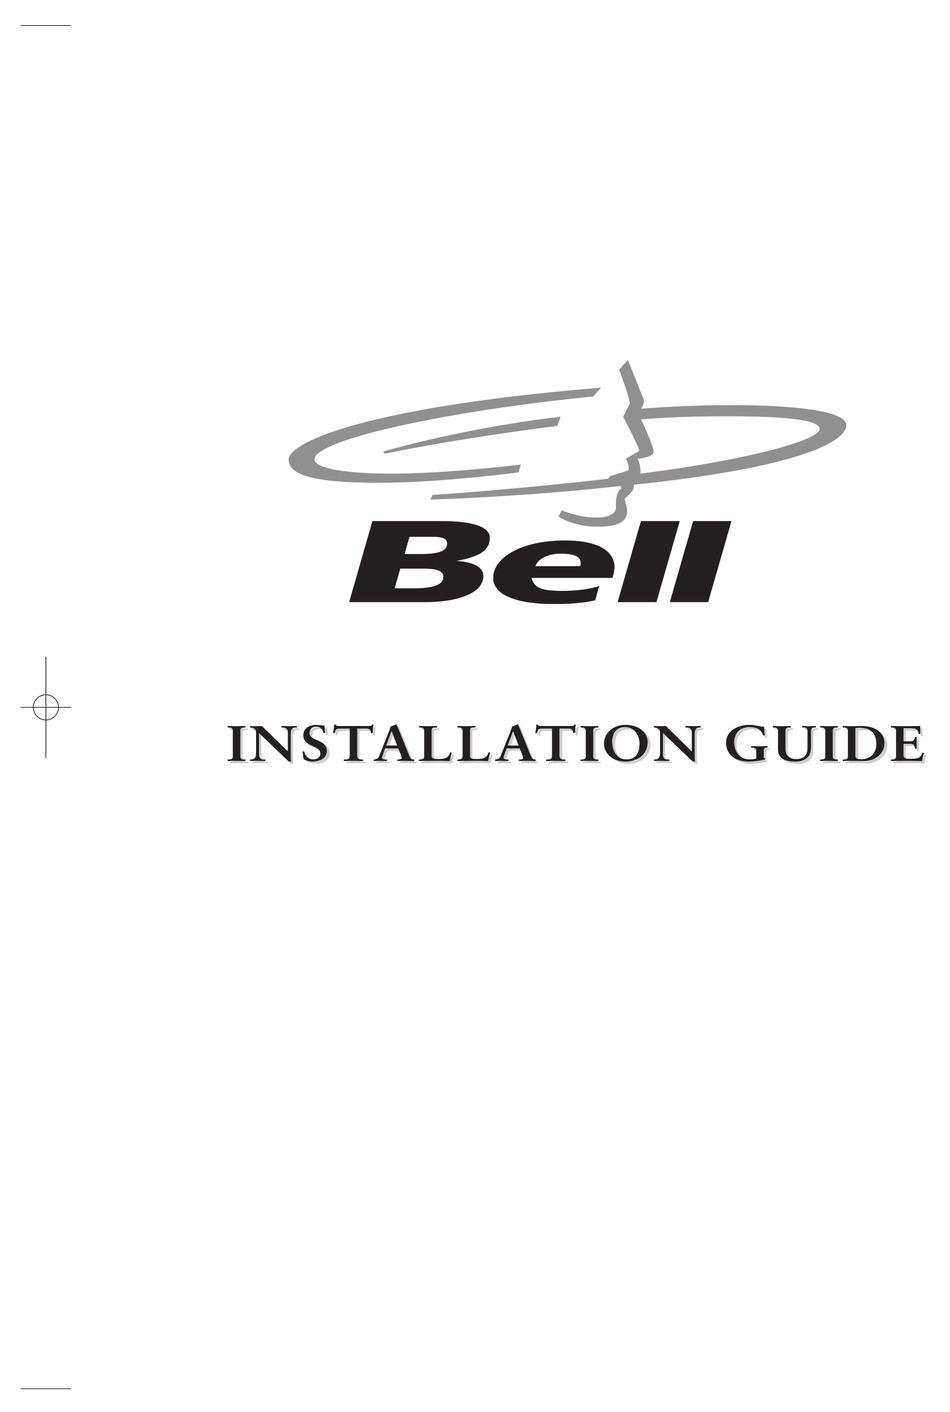 Bell Expressvu Installation Manual Pdf